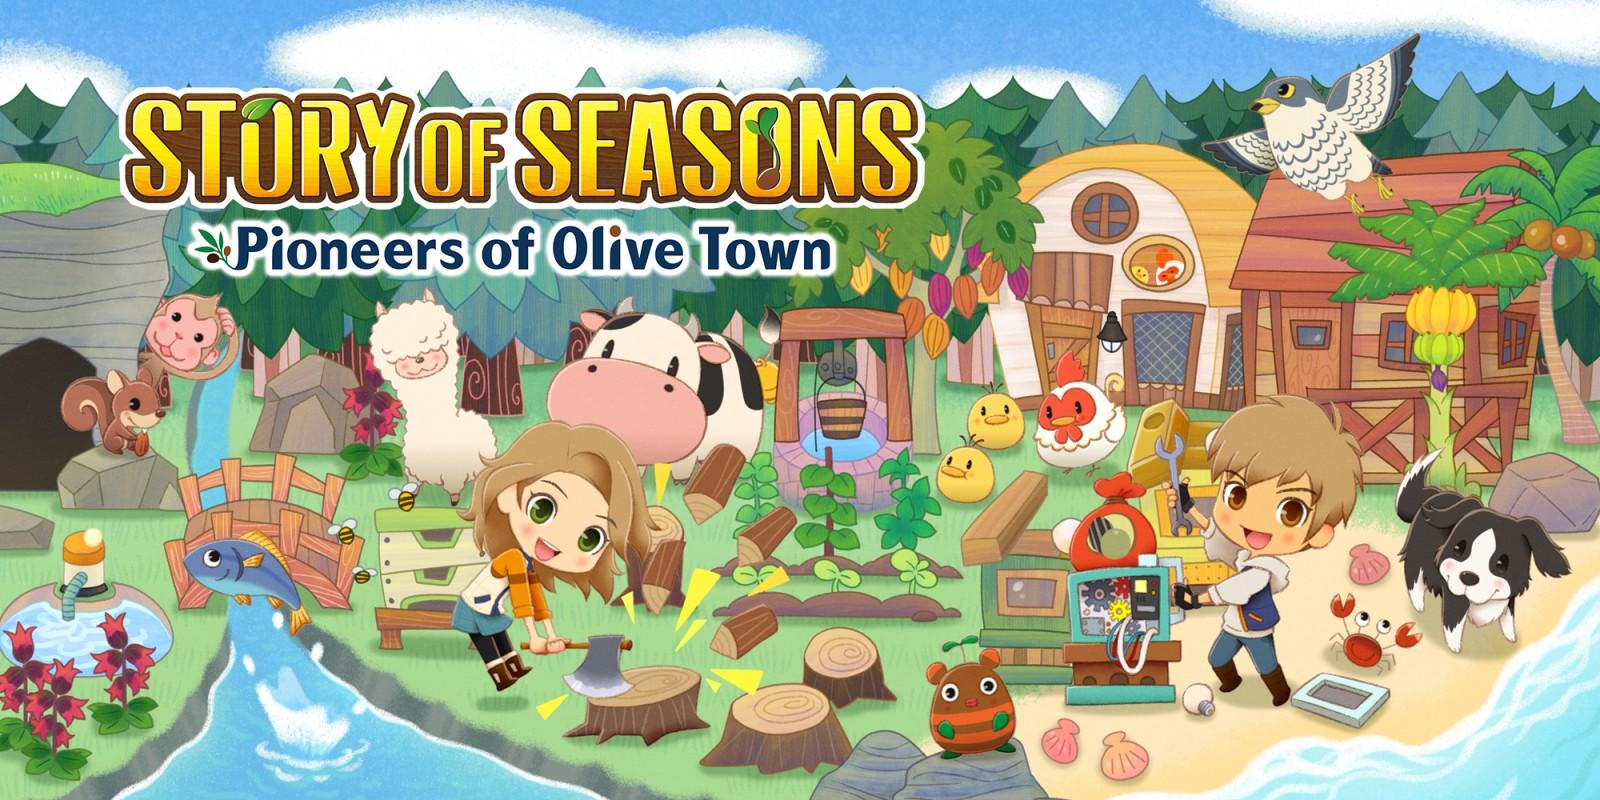 STORY OF SEASONS: Pioneers of Olive Town | Nintendo Switch | Giochi |  Nintendo